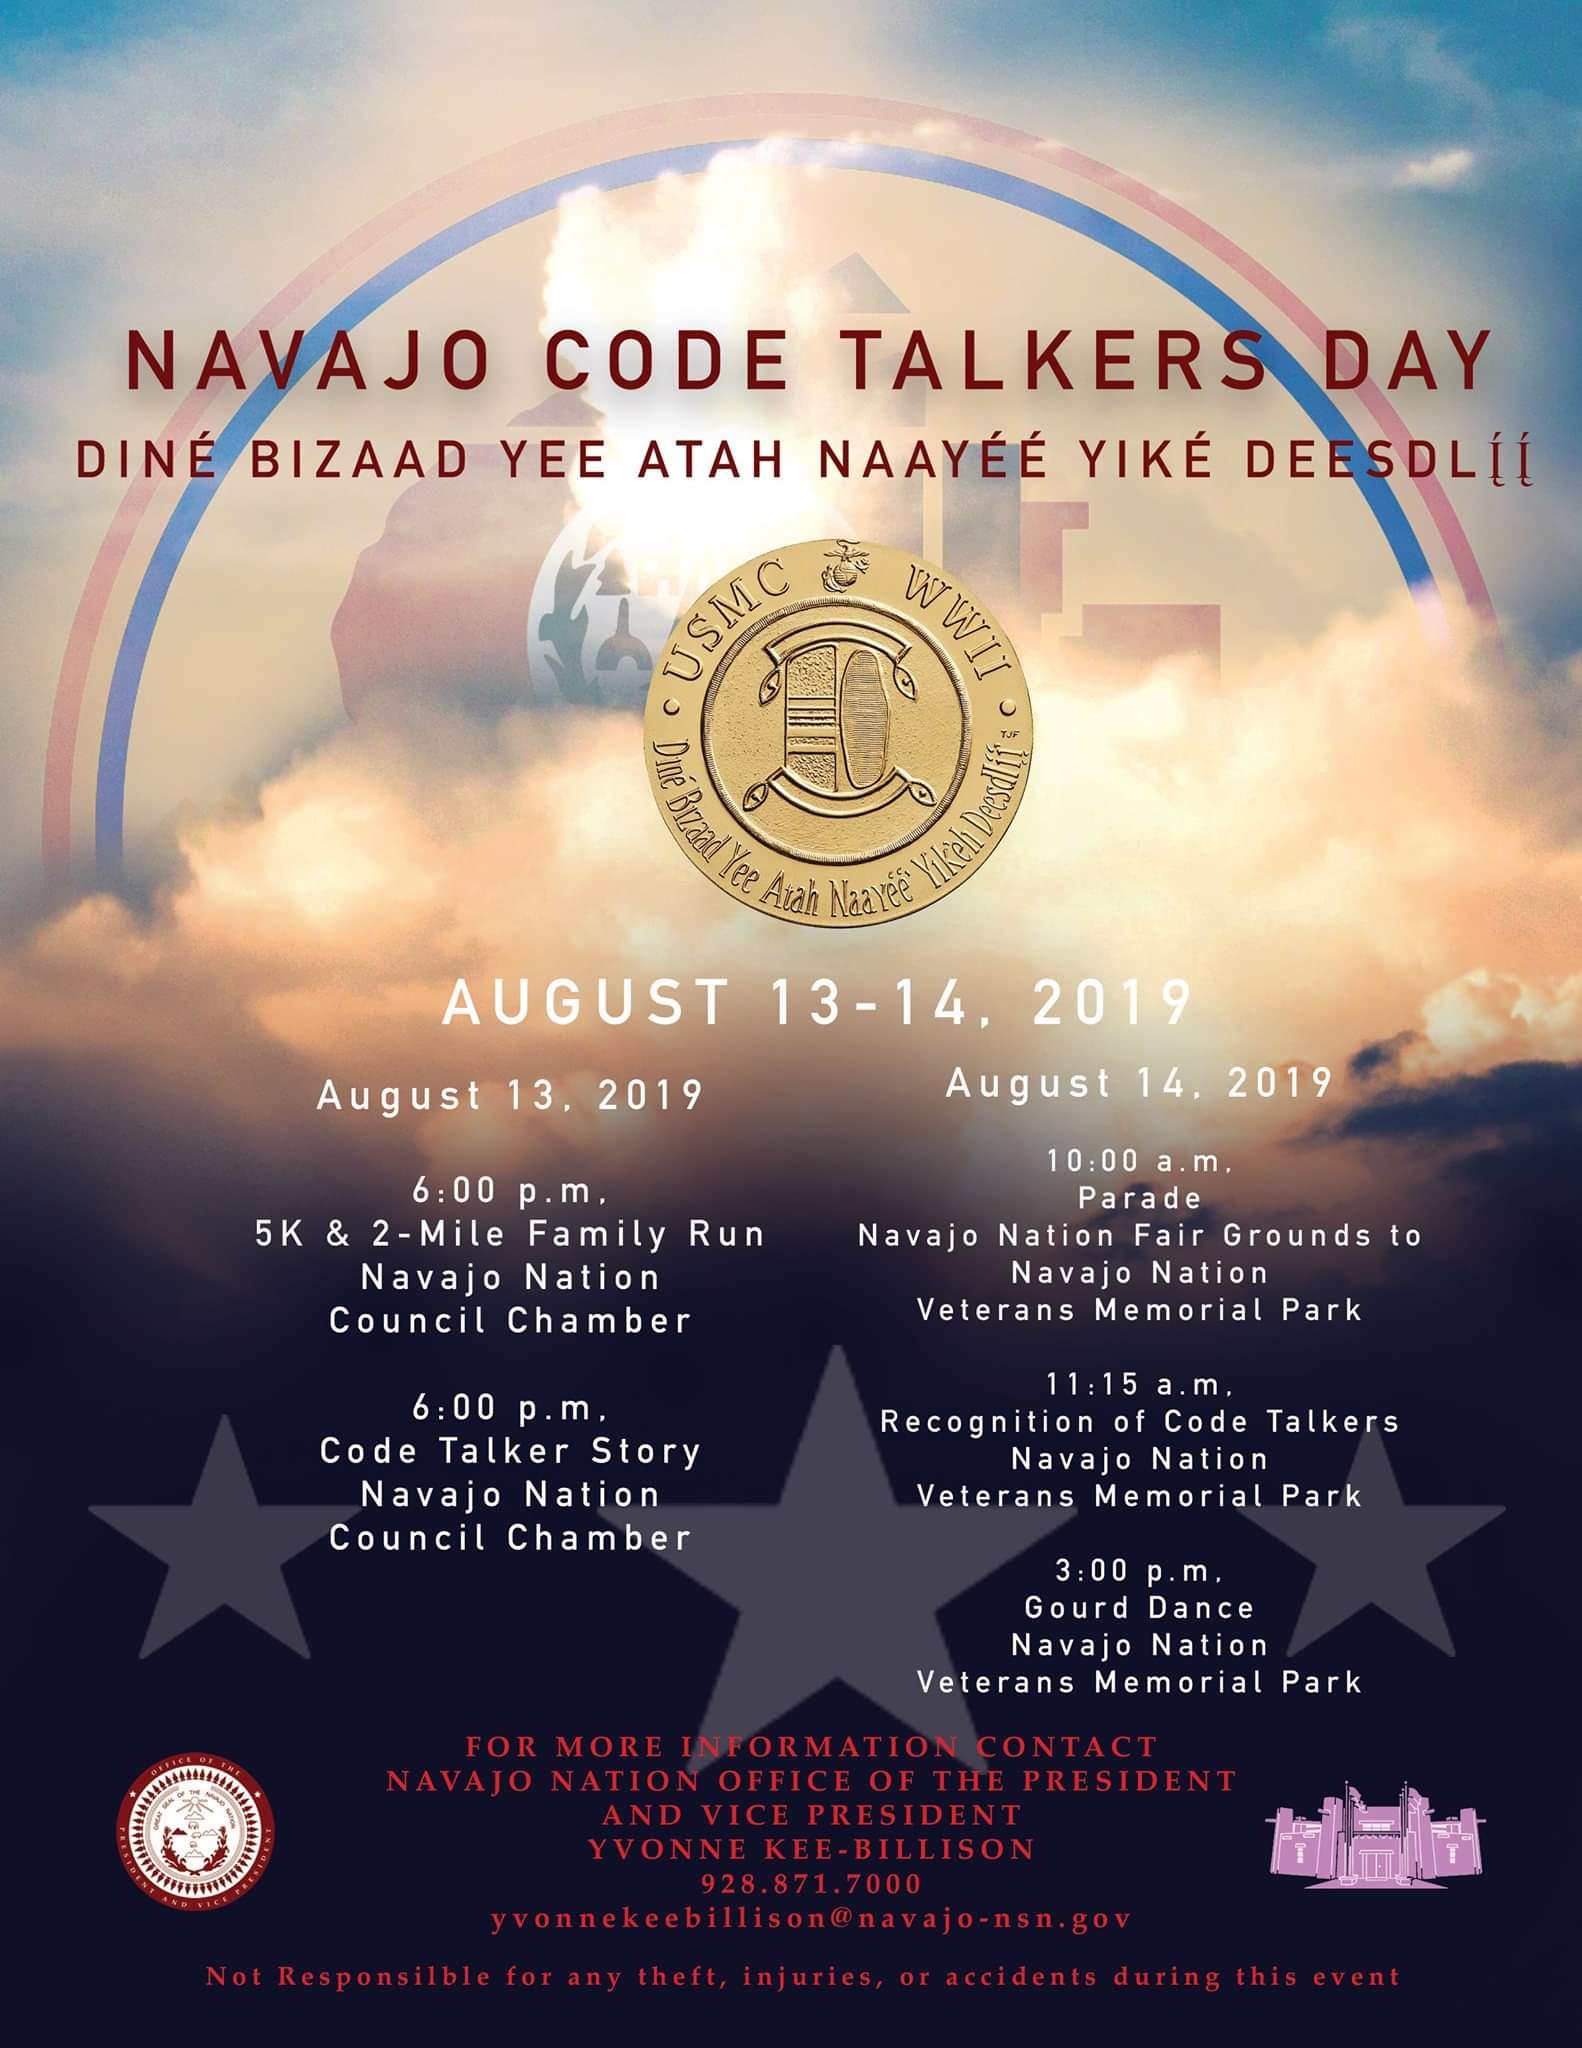 NNavajo Code Talker Day 2019